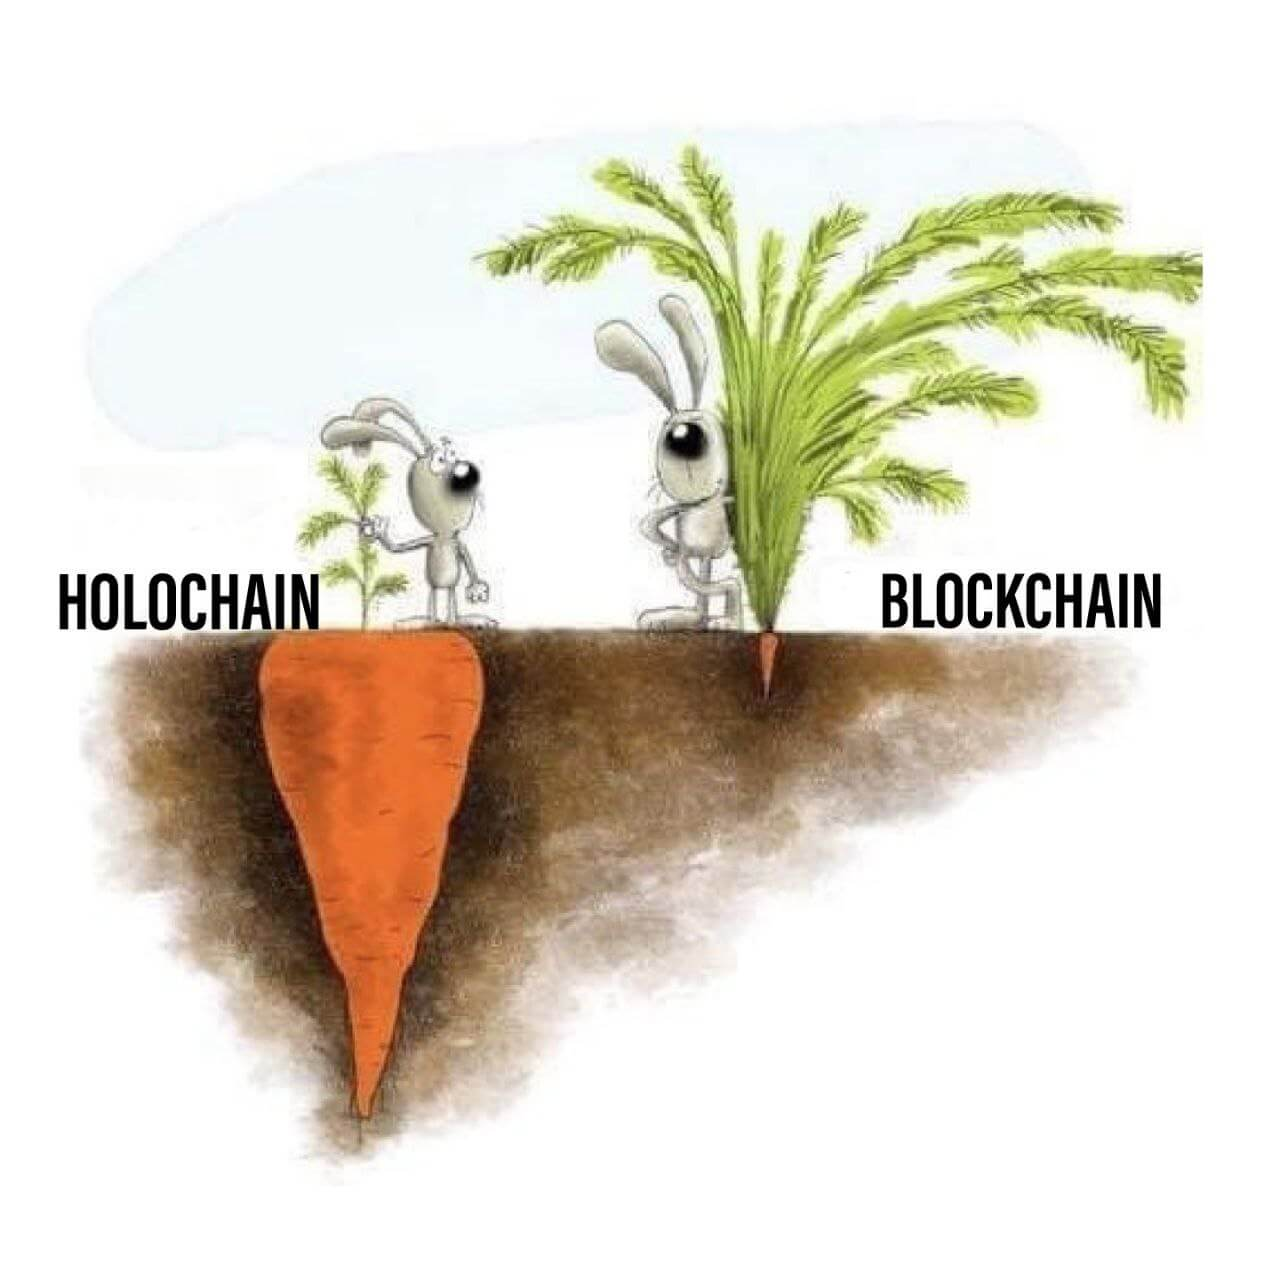 Holochain vs Blockchain meme